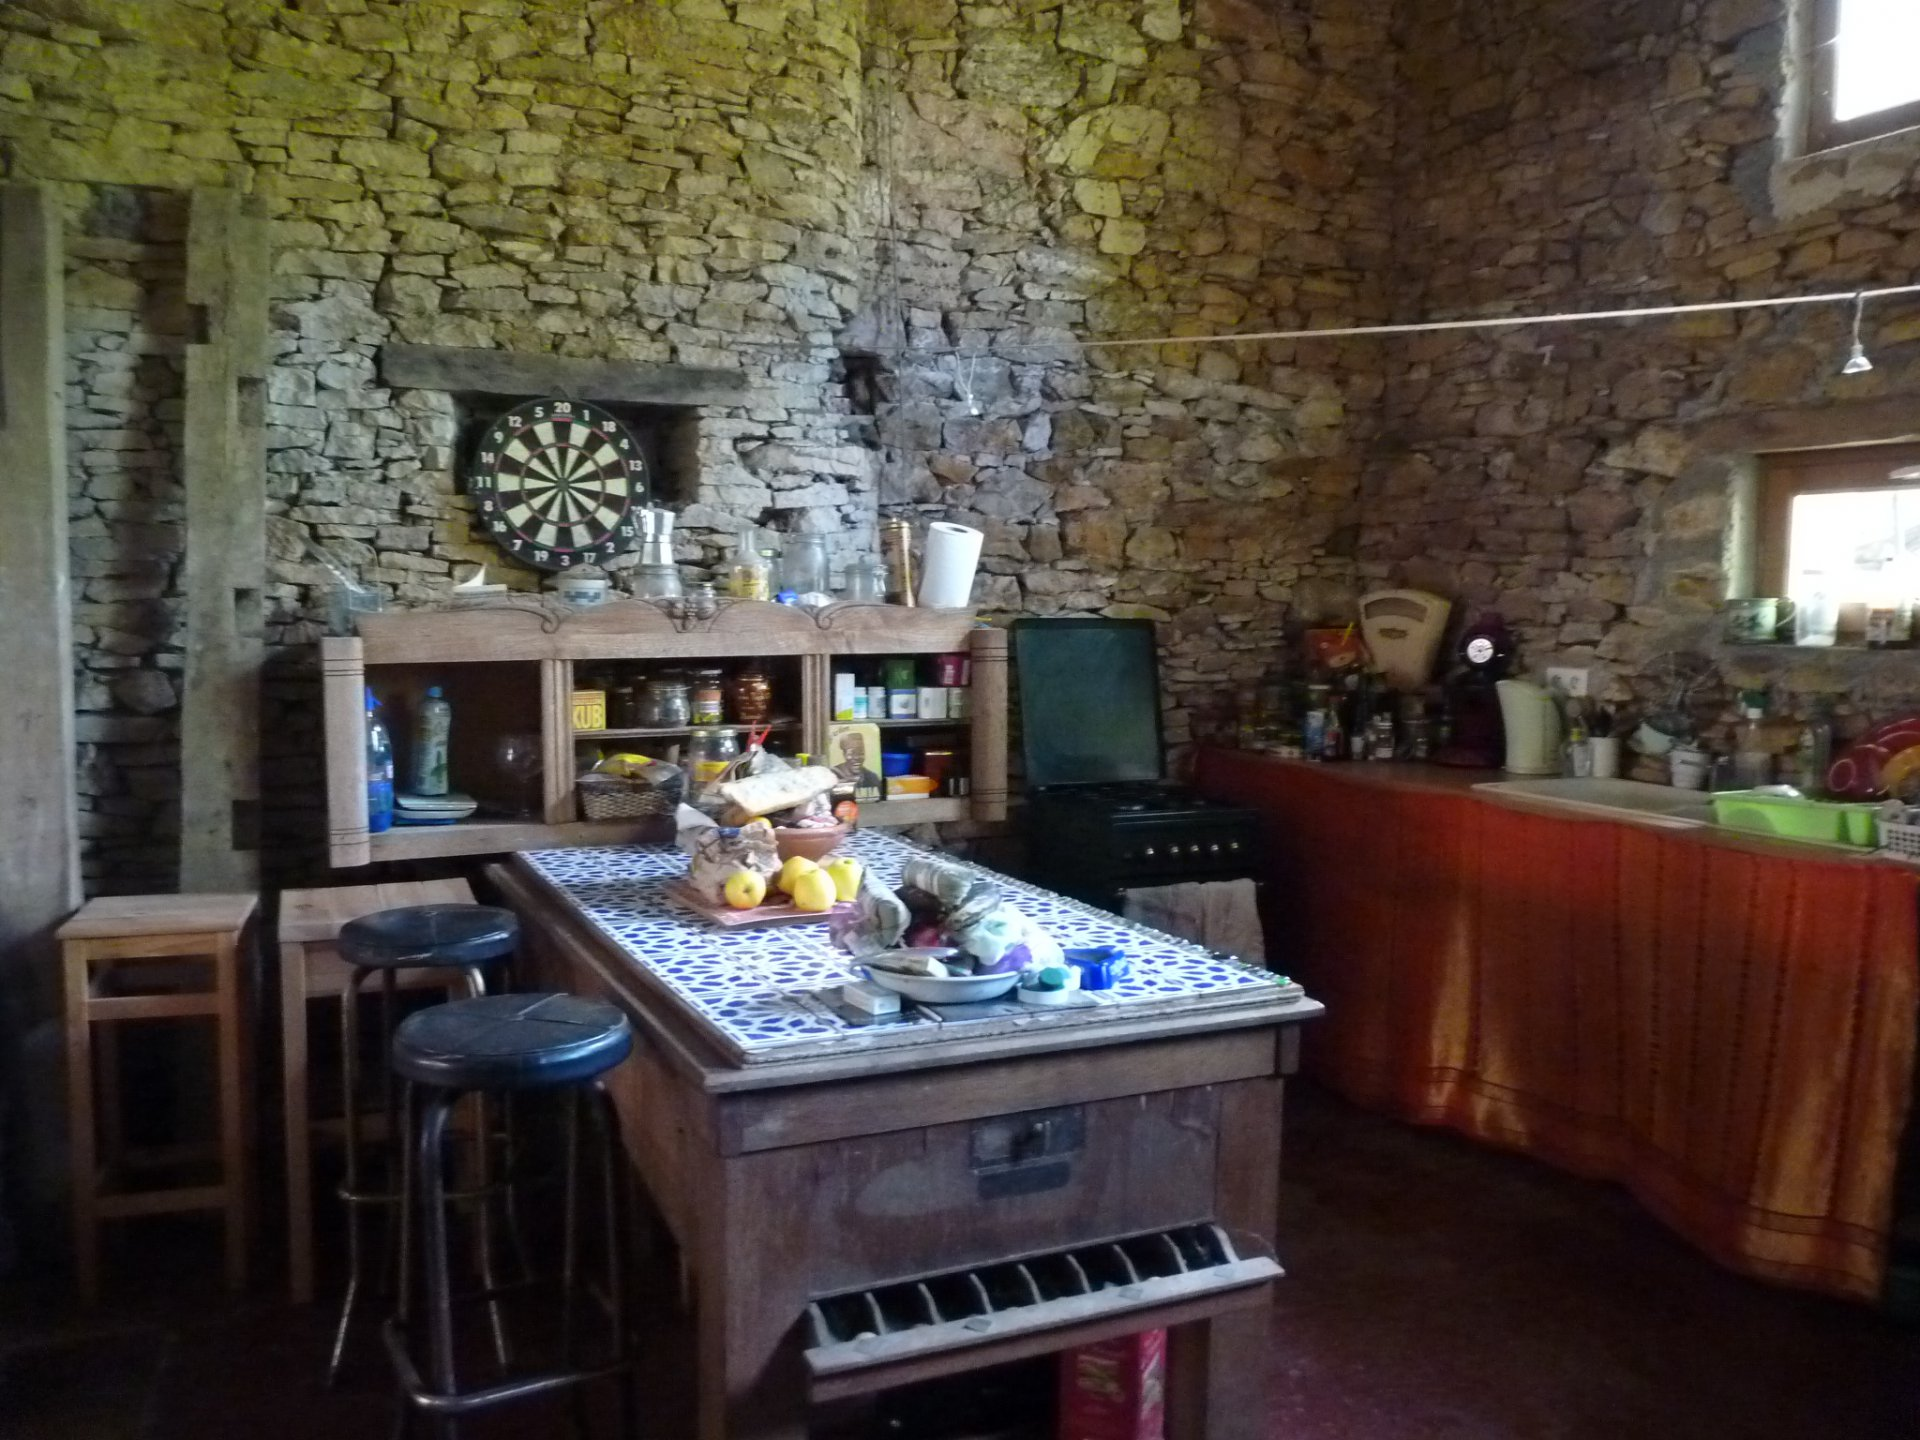 High ceiling, kitchen bar